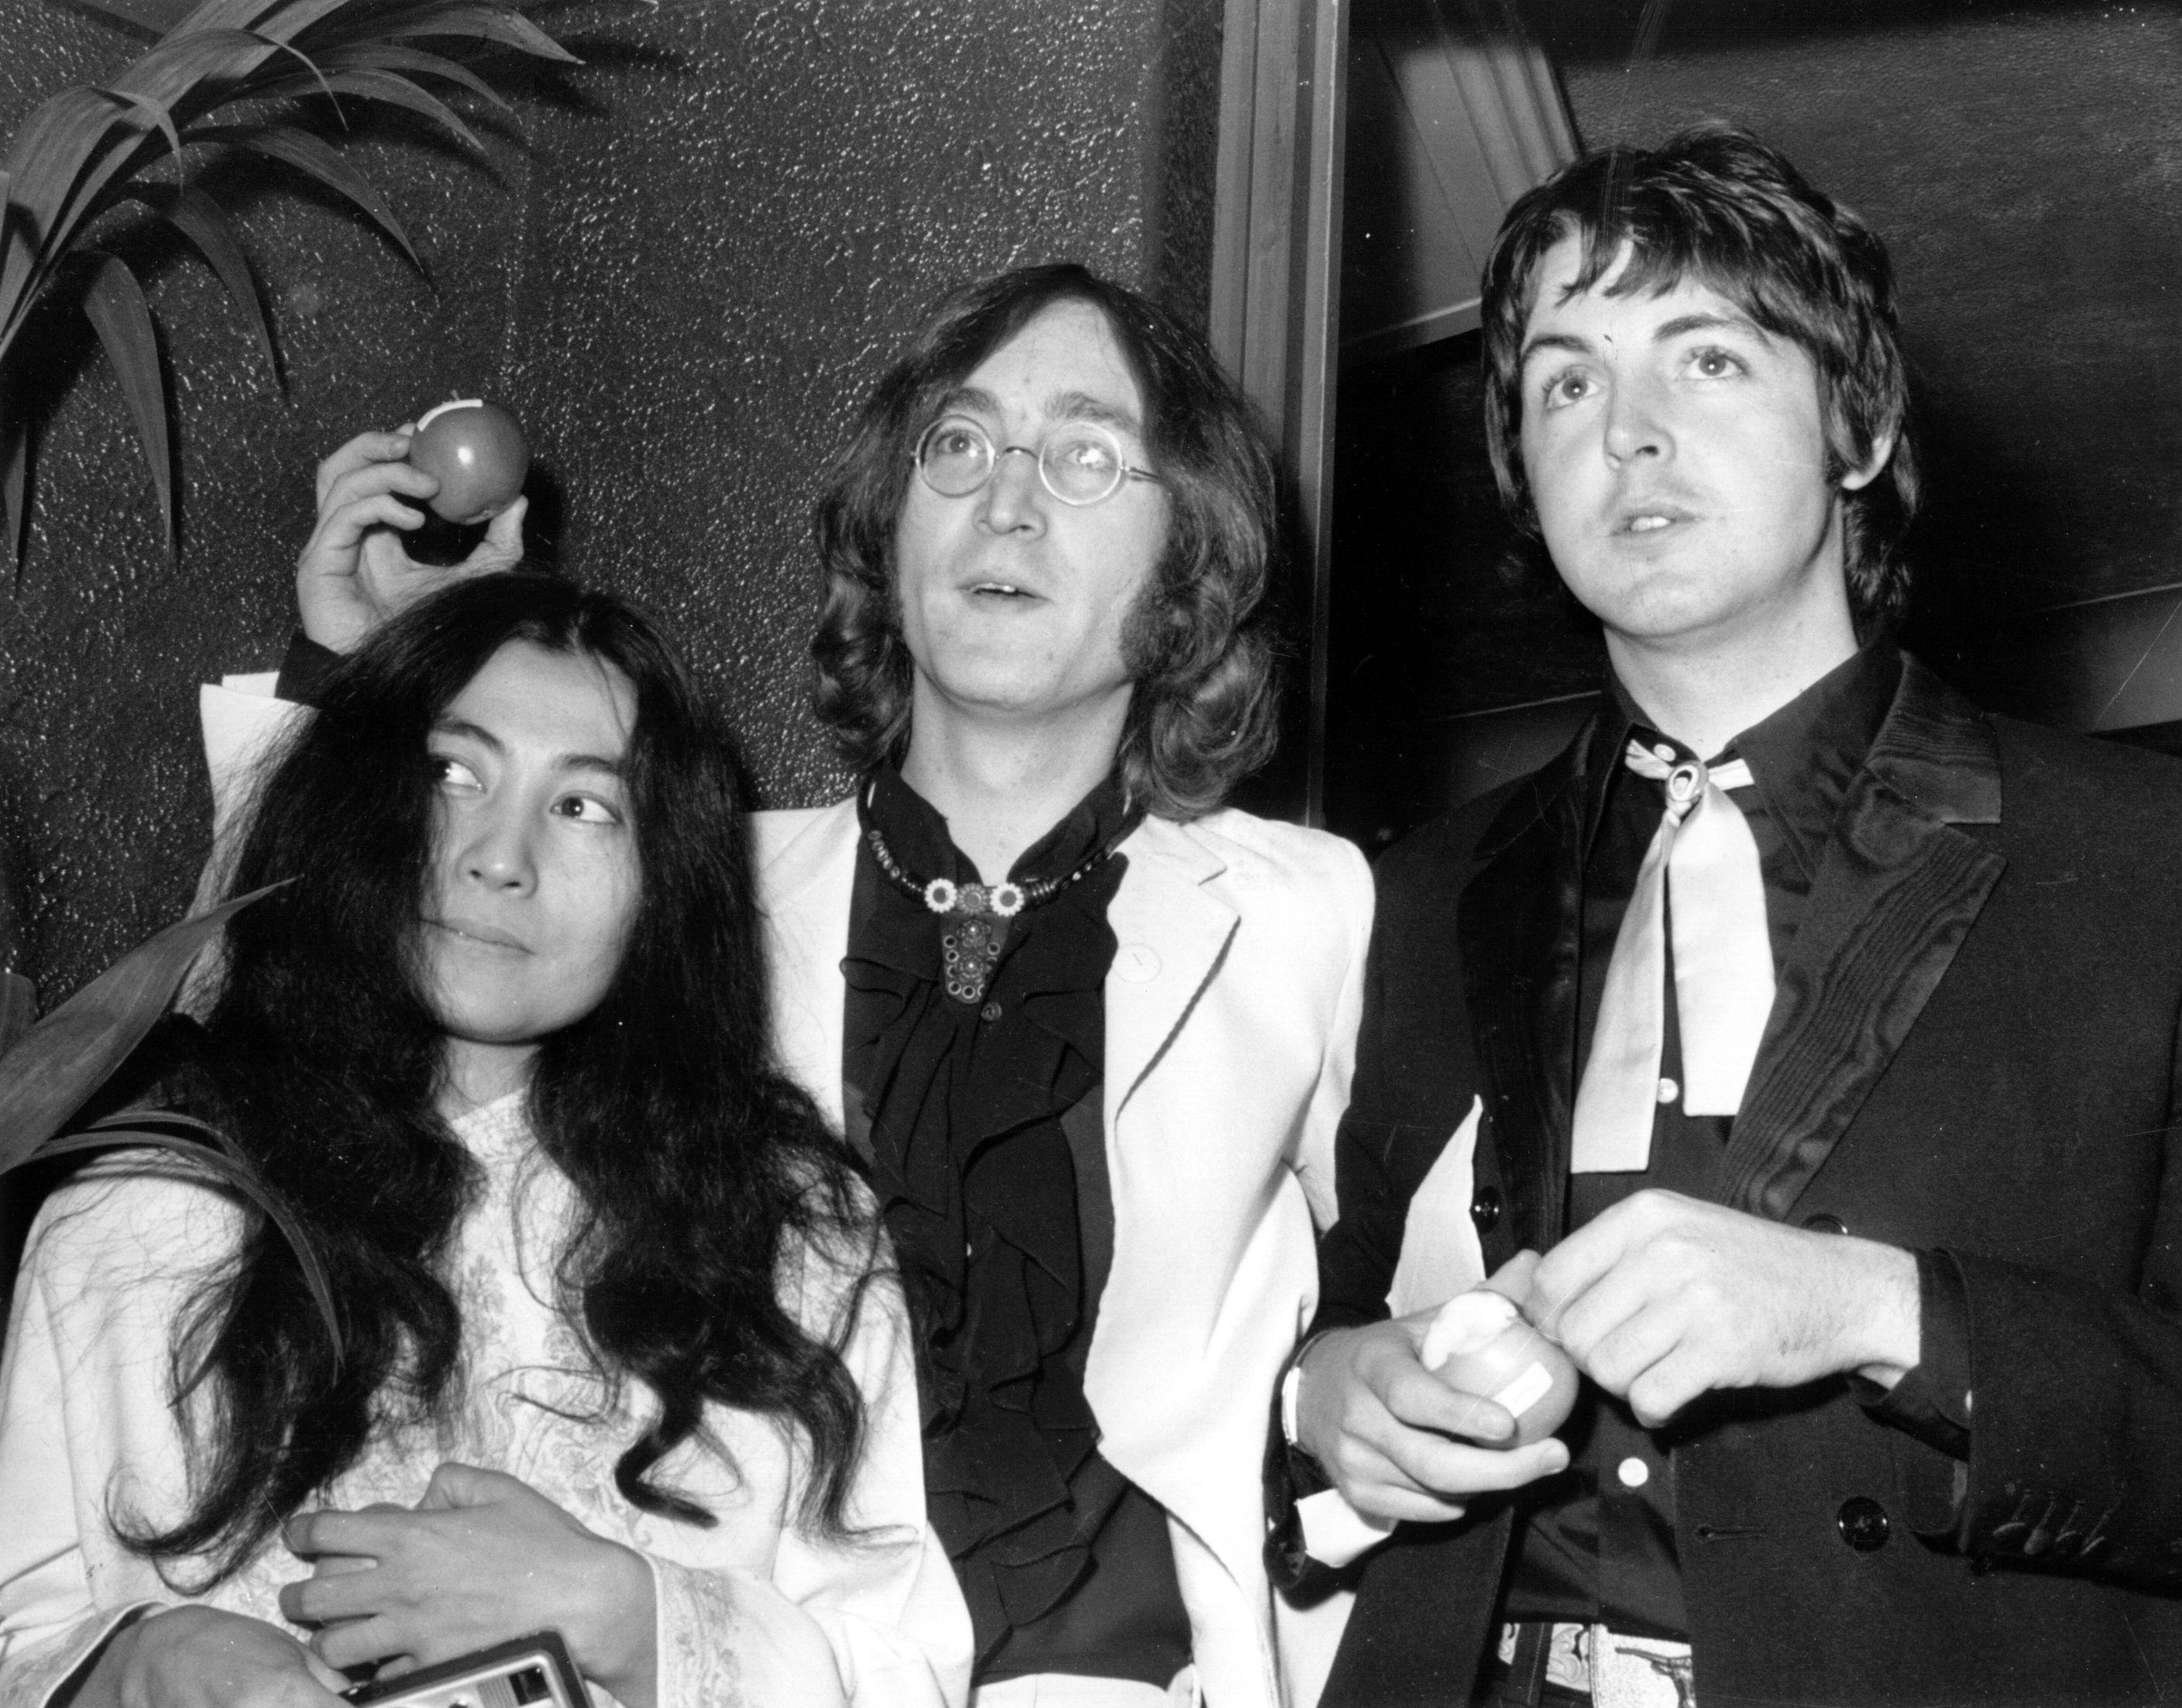 Yoko Ono, John Lennon and Paul McCartney The Beatl